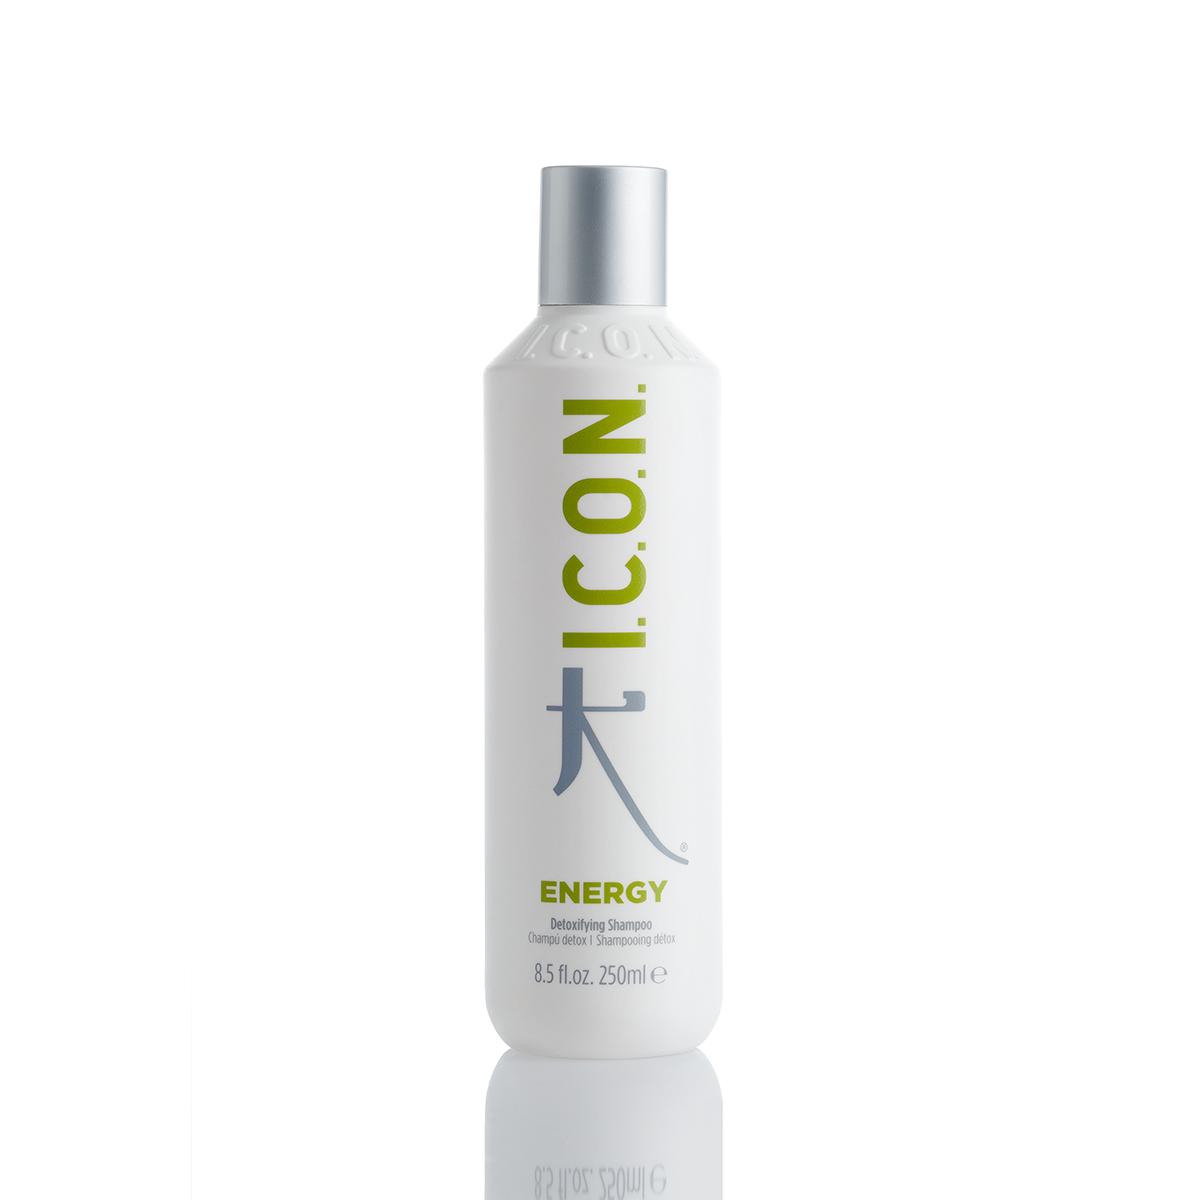 Champú desintoxificante Energy de I.C.O.N. Products